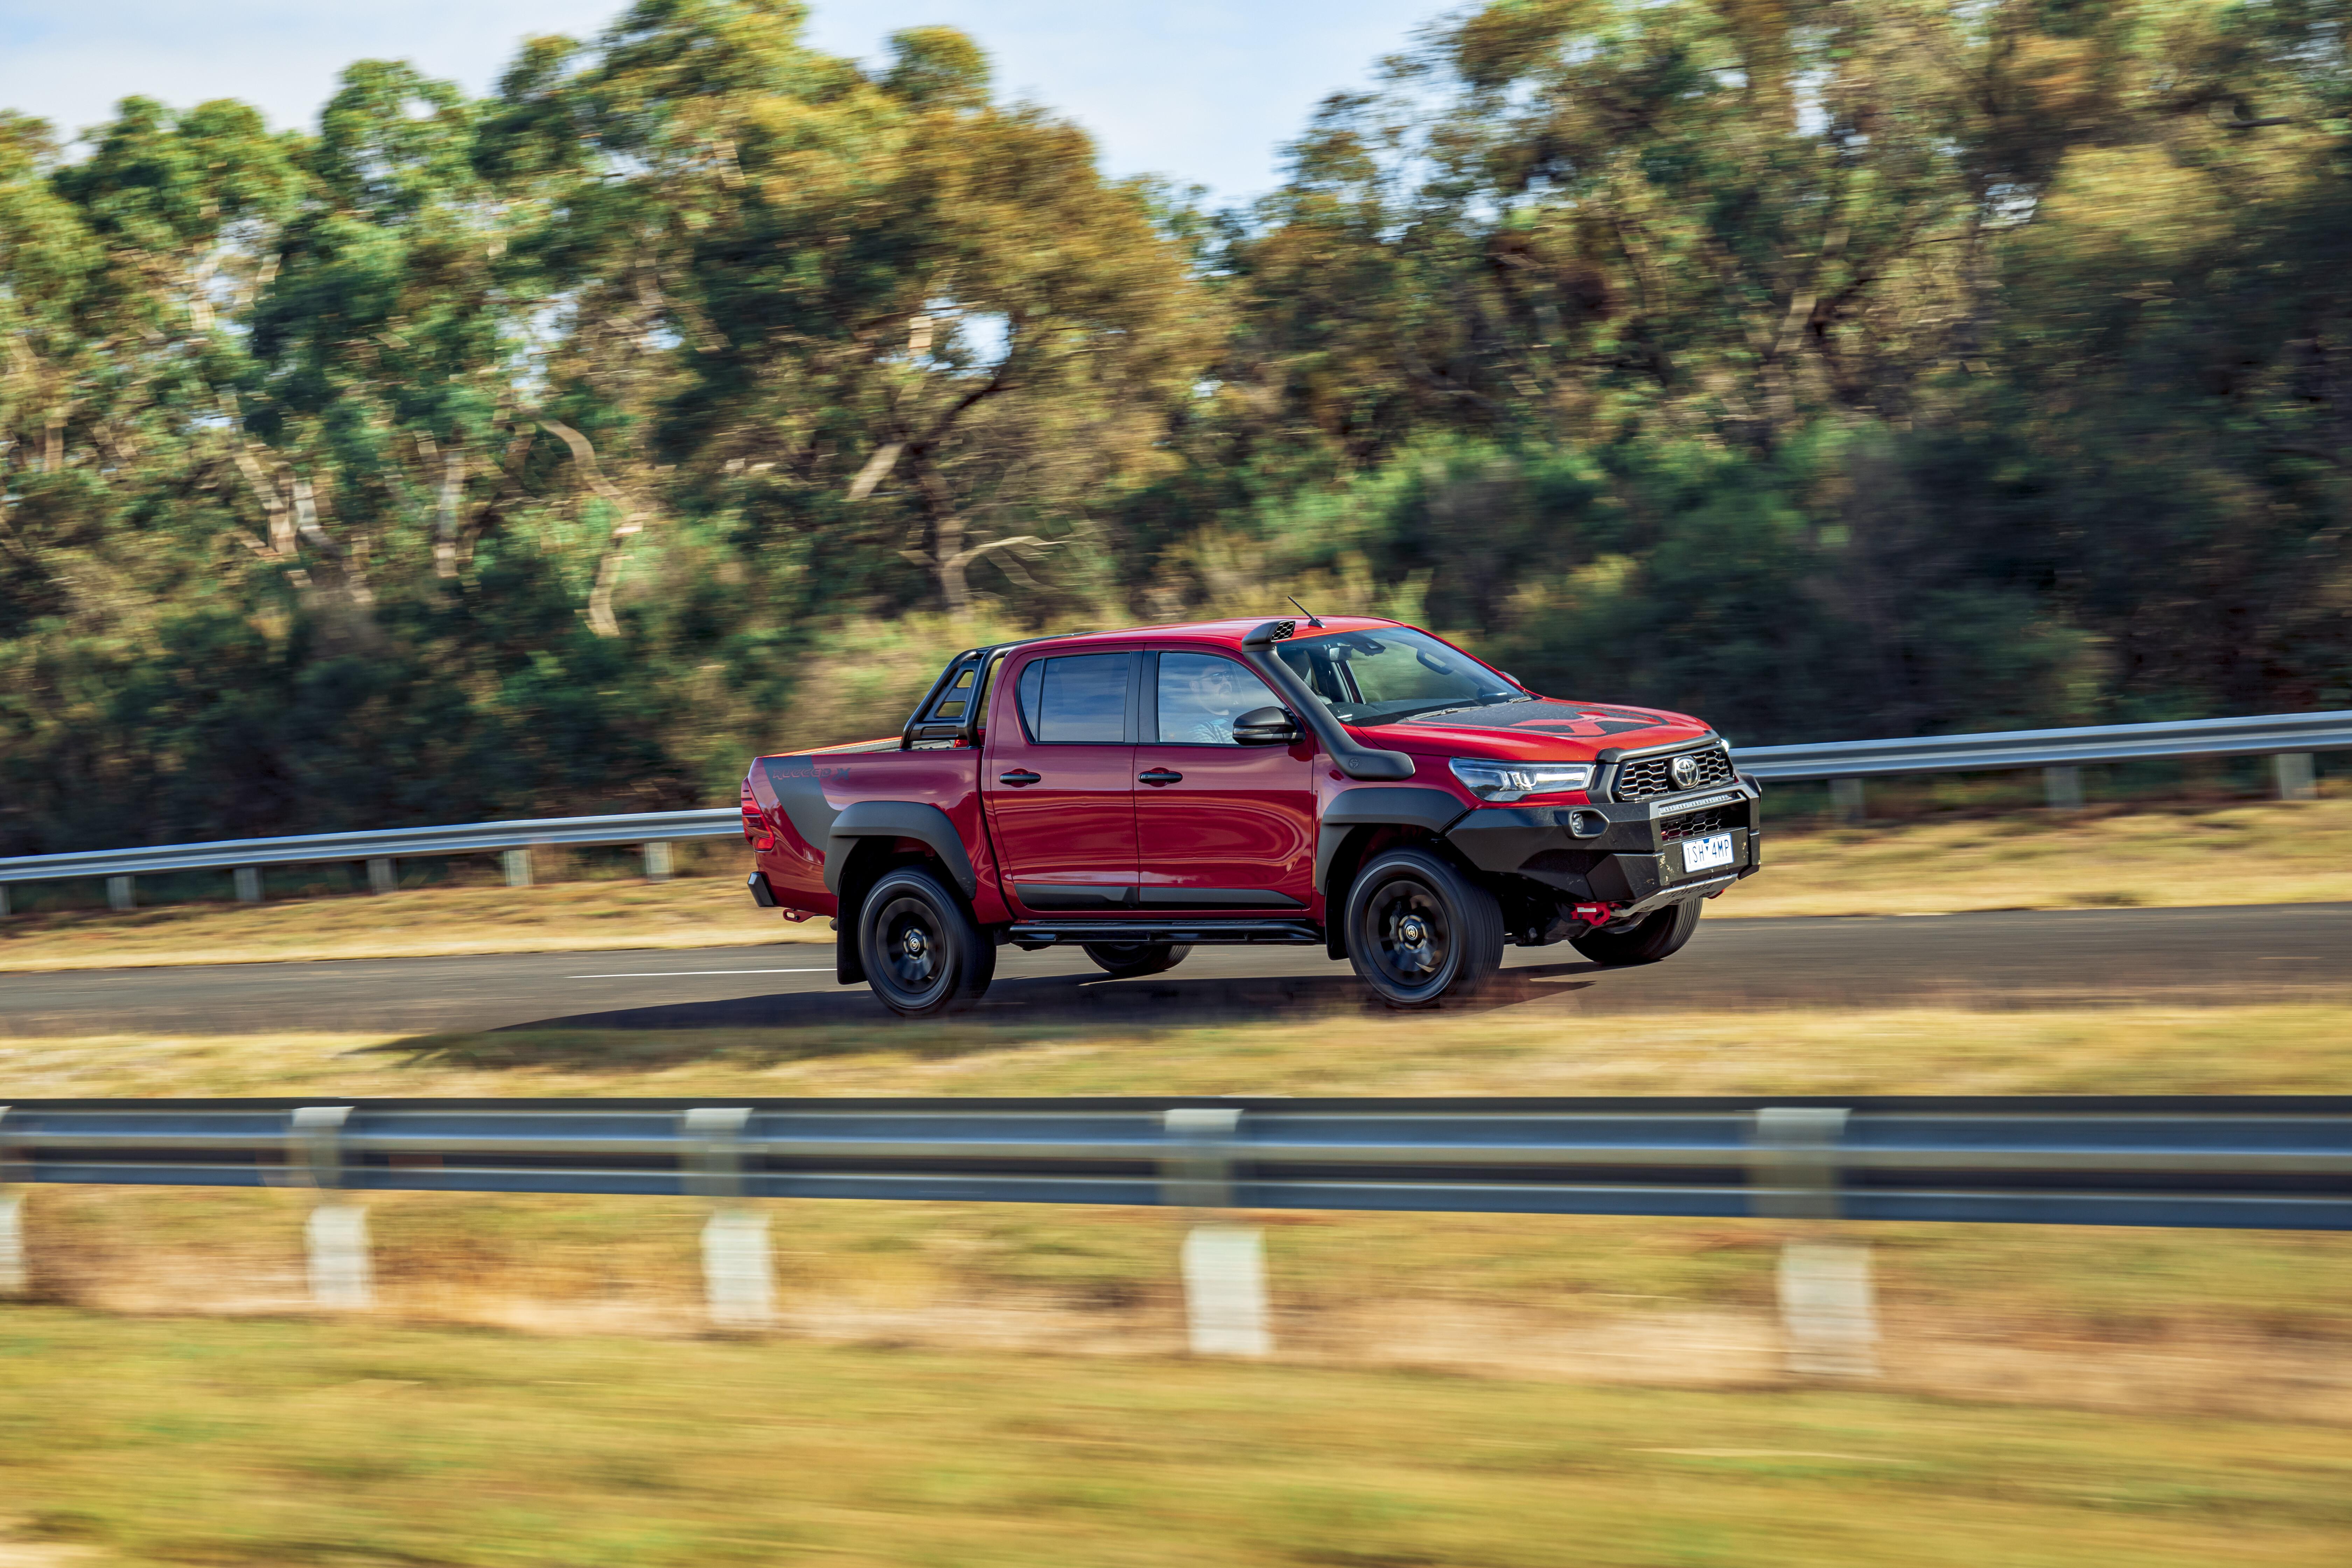 4 X 4 Australia Comparisons 2021 May 21 Toyota Hilux Rugged X Drive